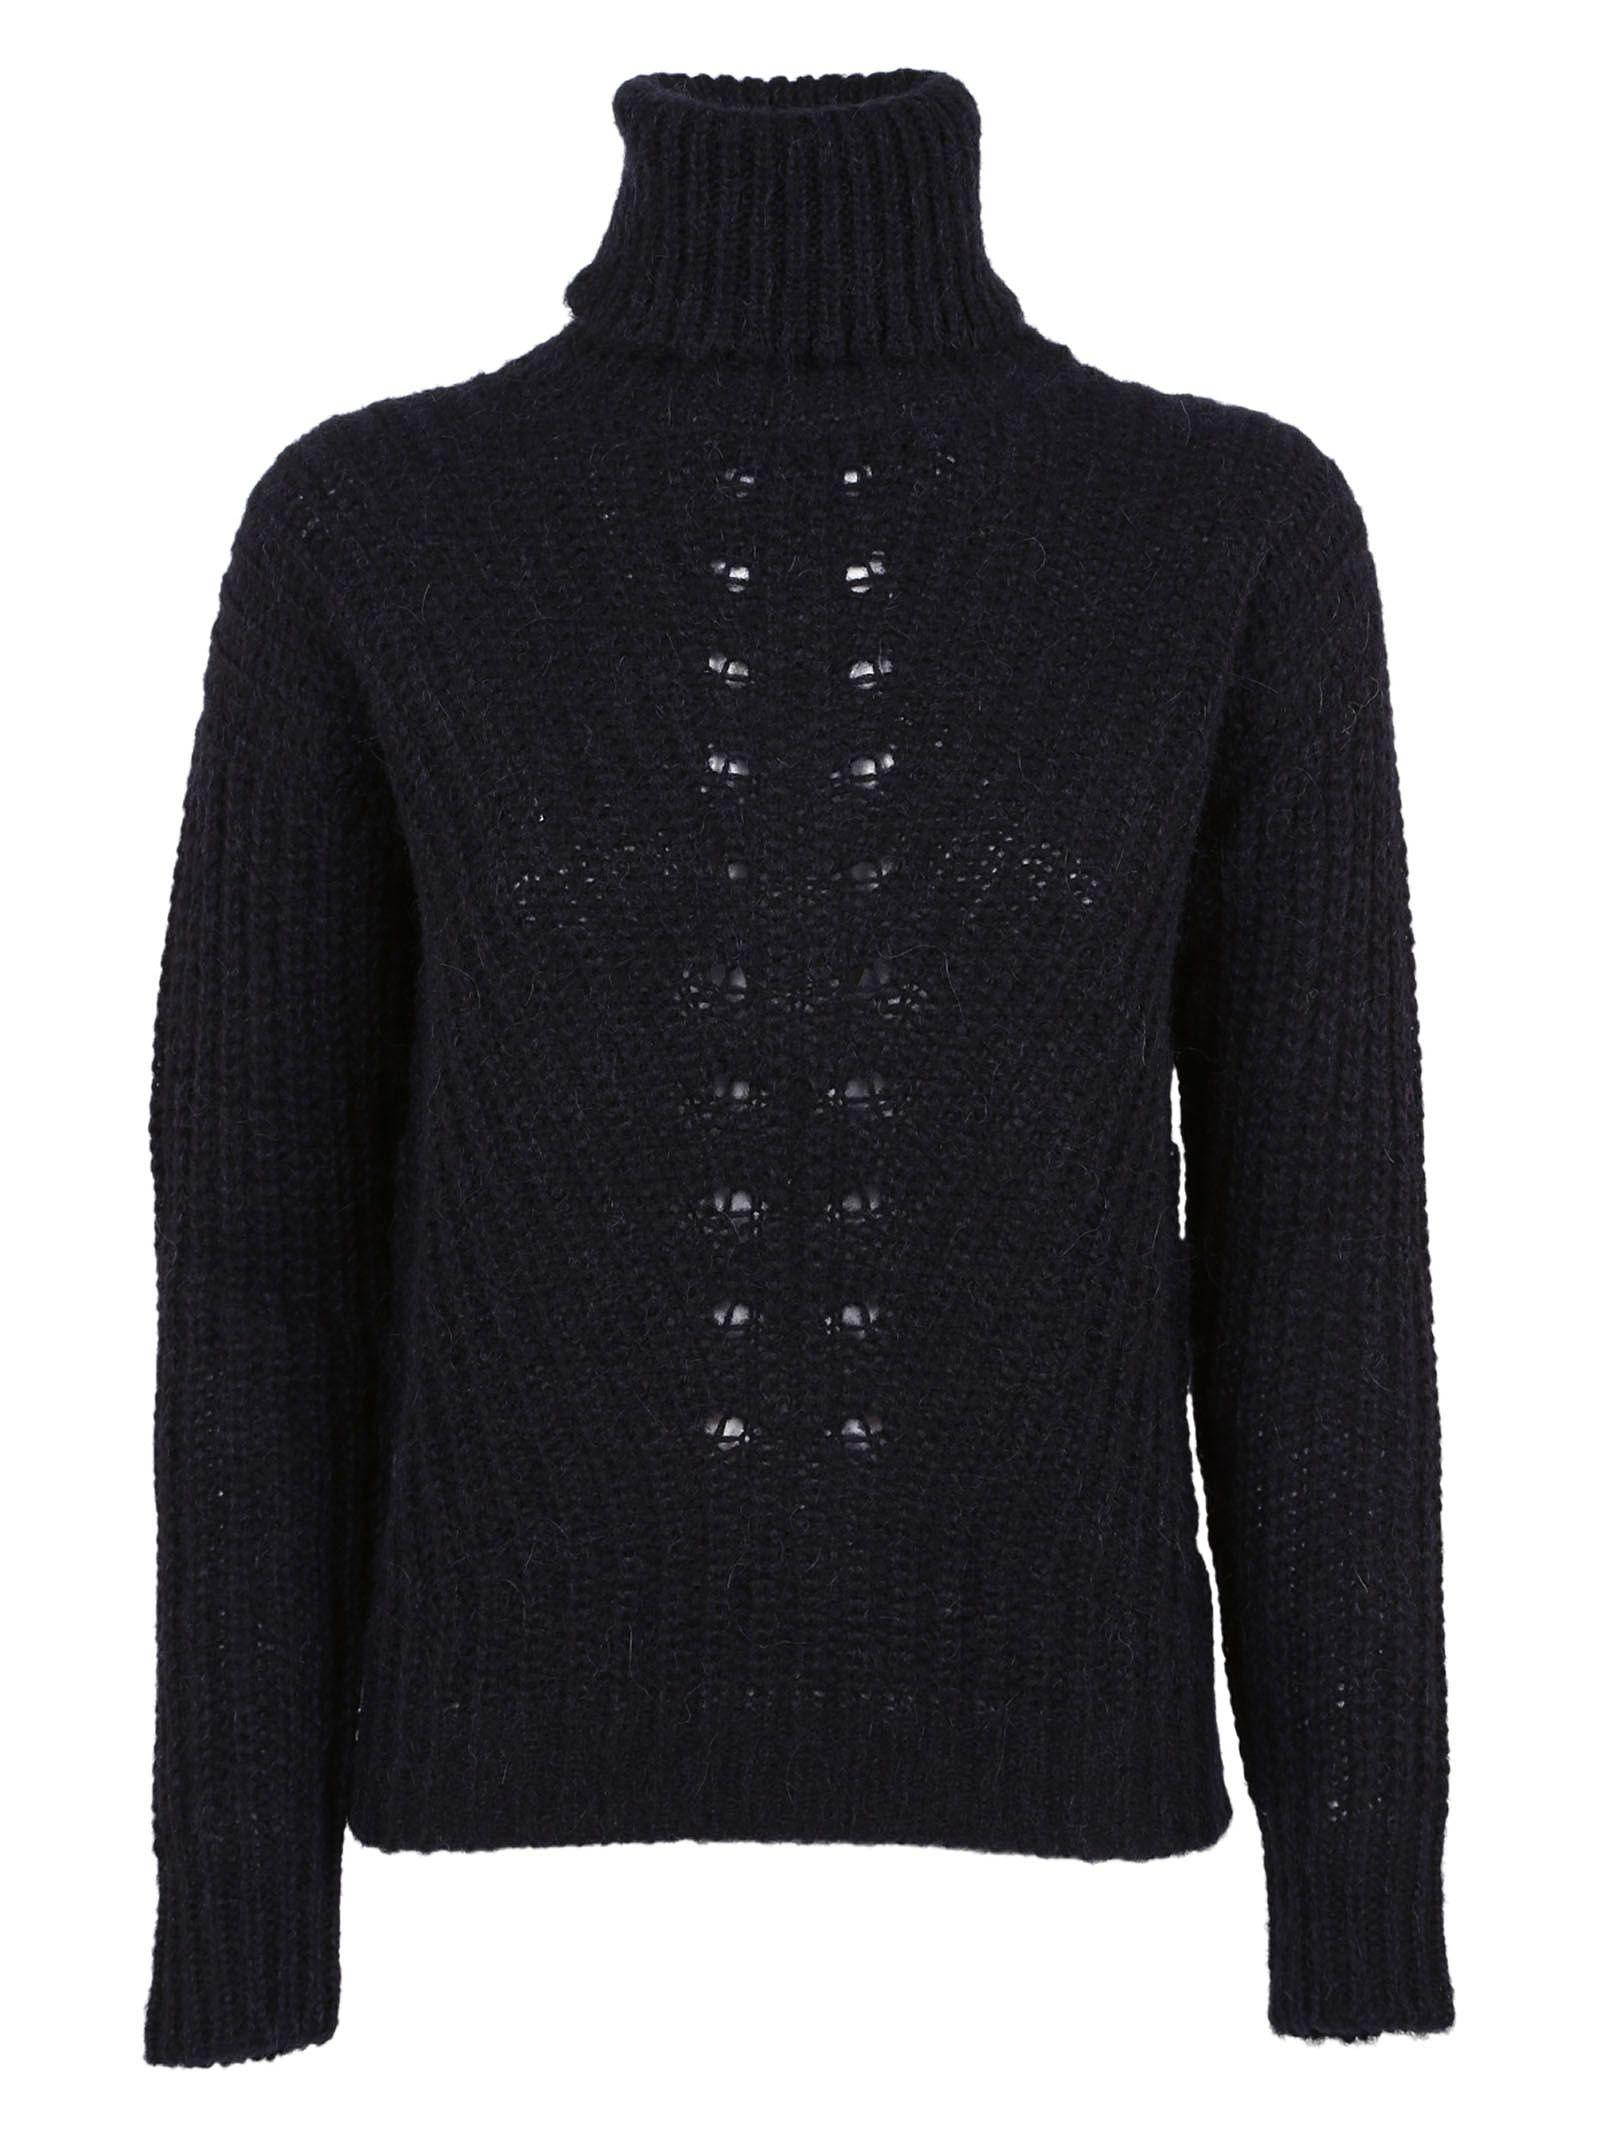 Peserico Turtleneck Sweater